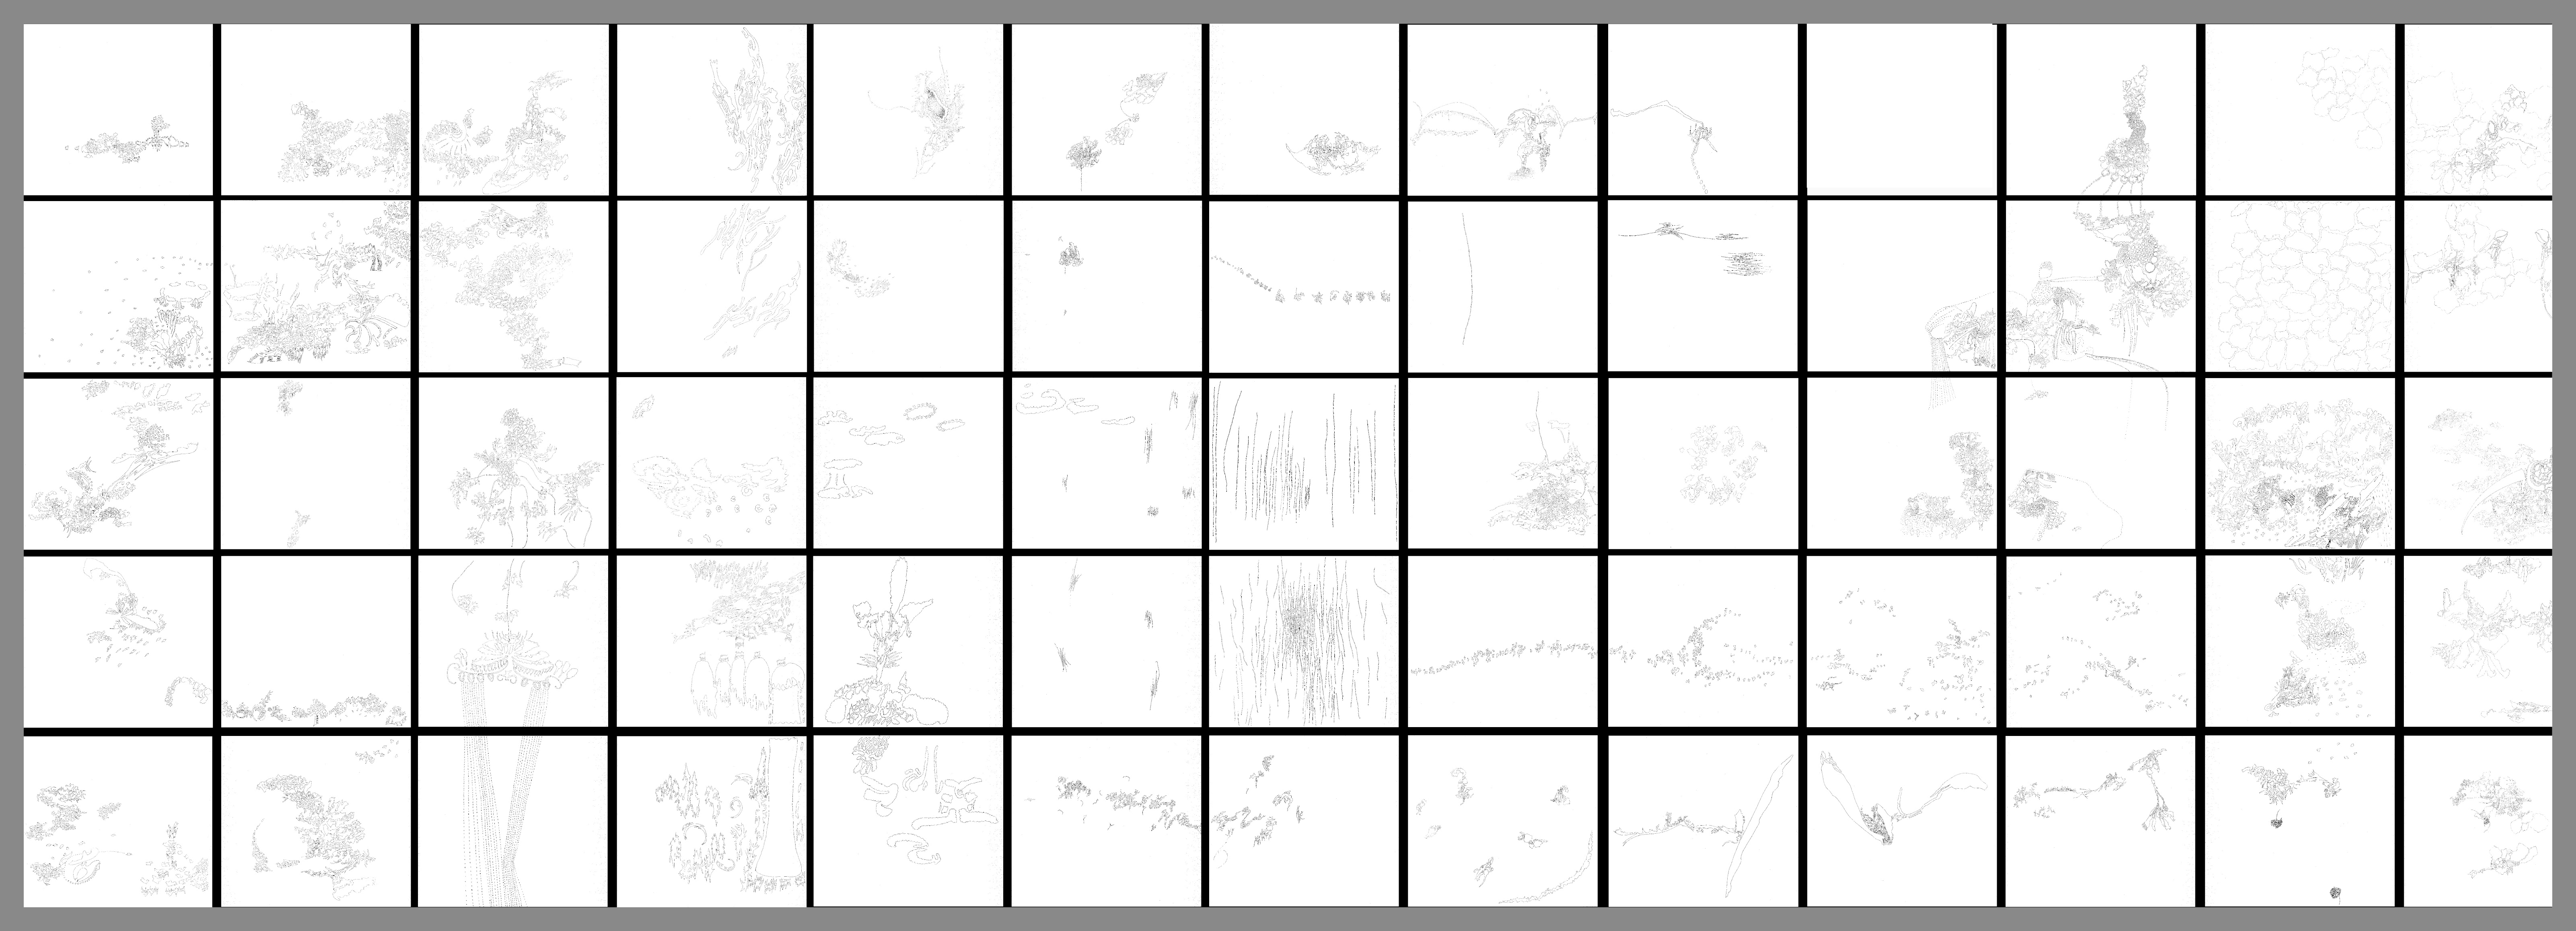 drawing-22.jpg